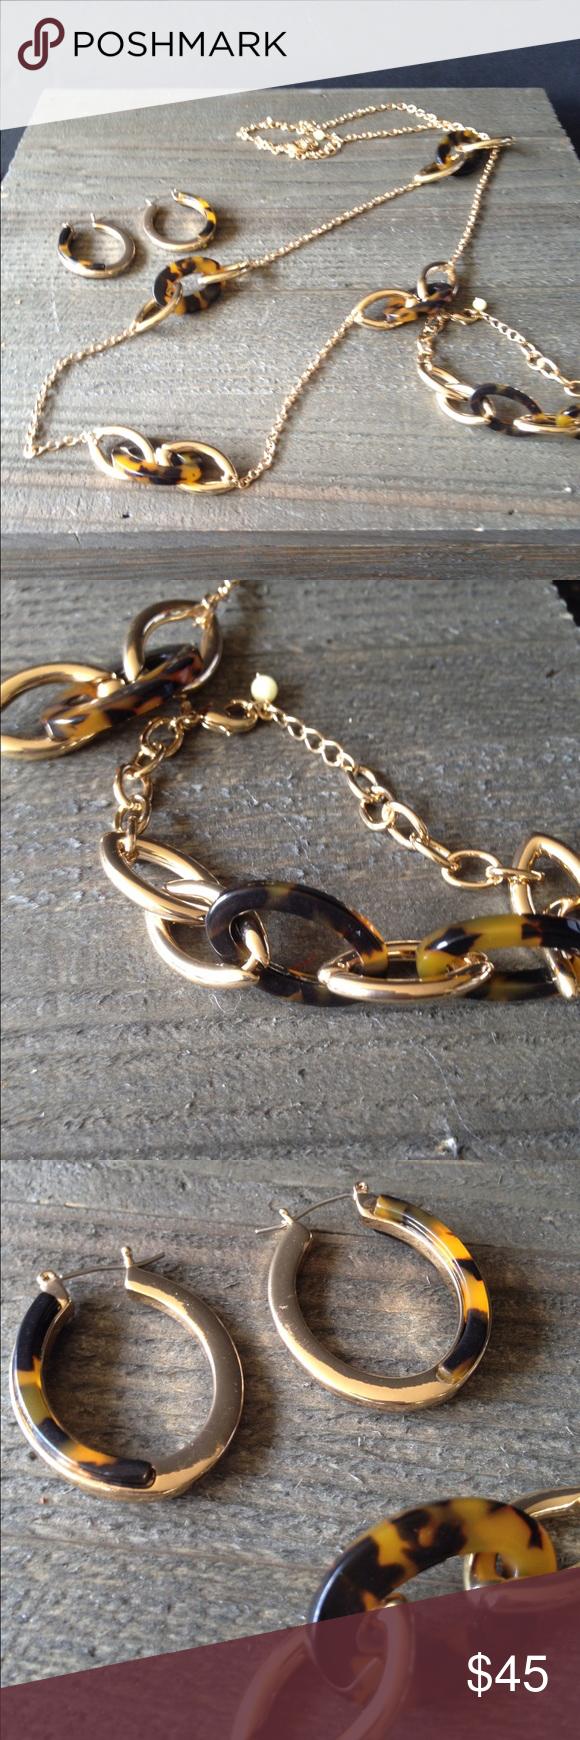 Gold coast necklace bracelet and earrings set my posh closet